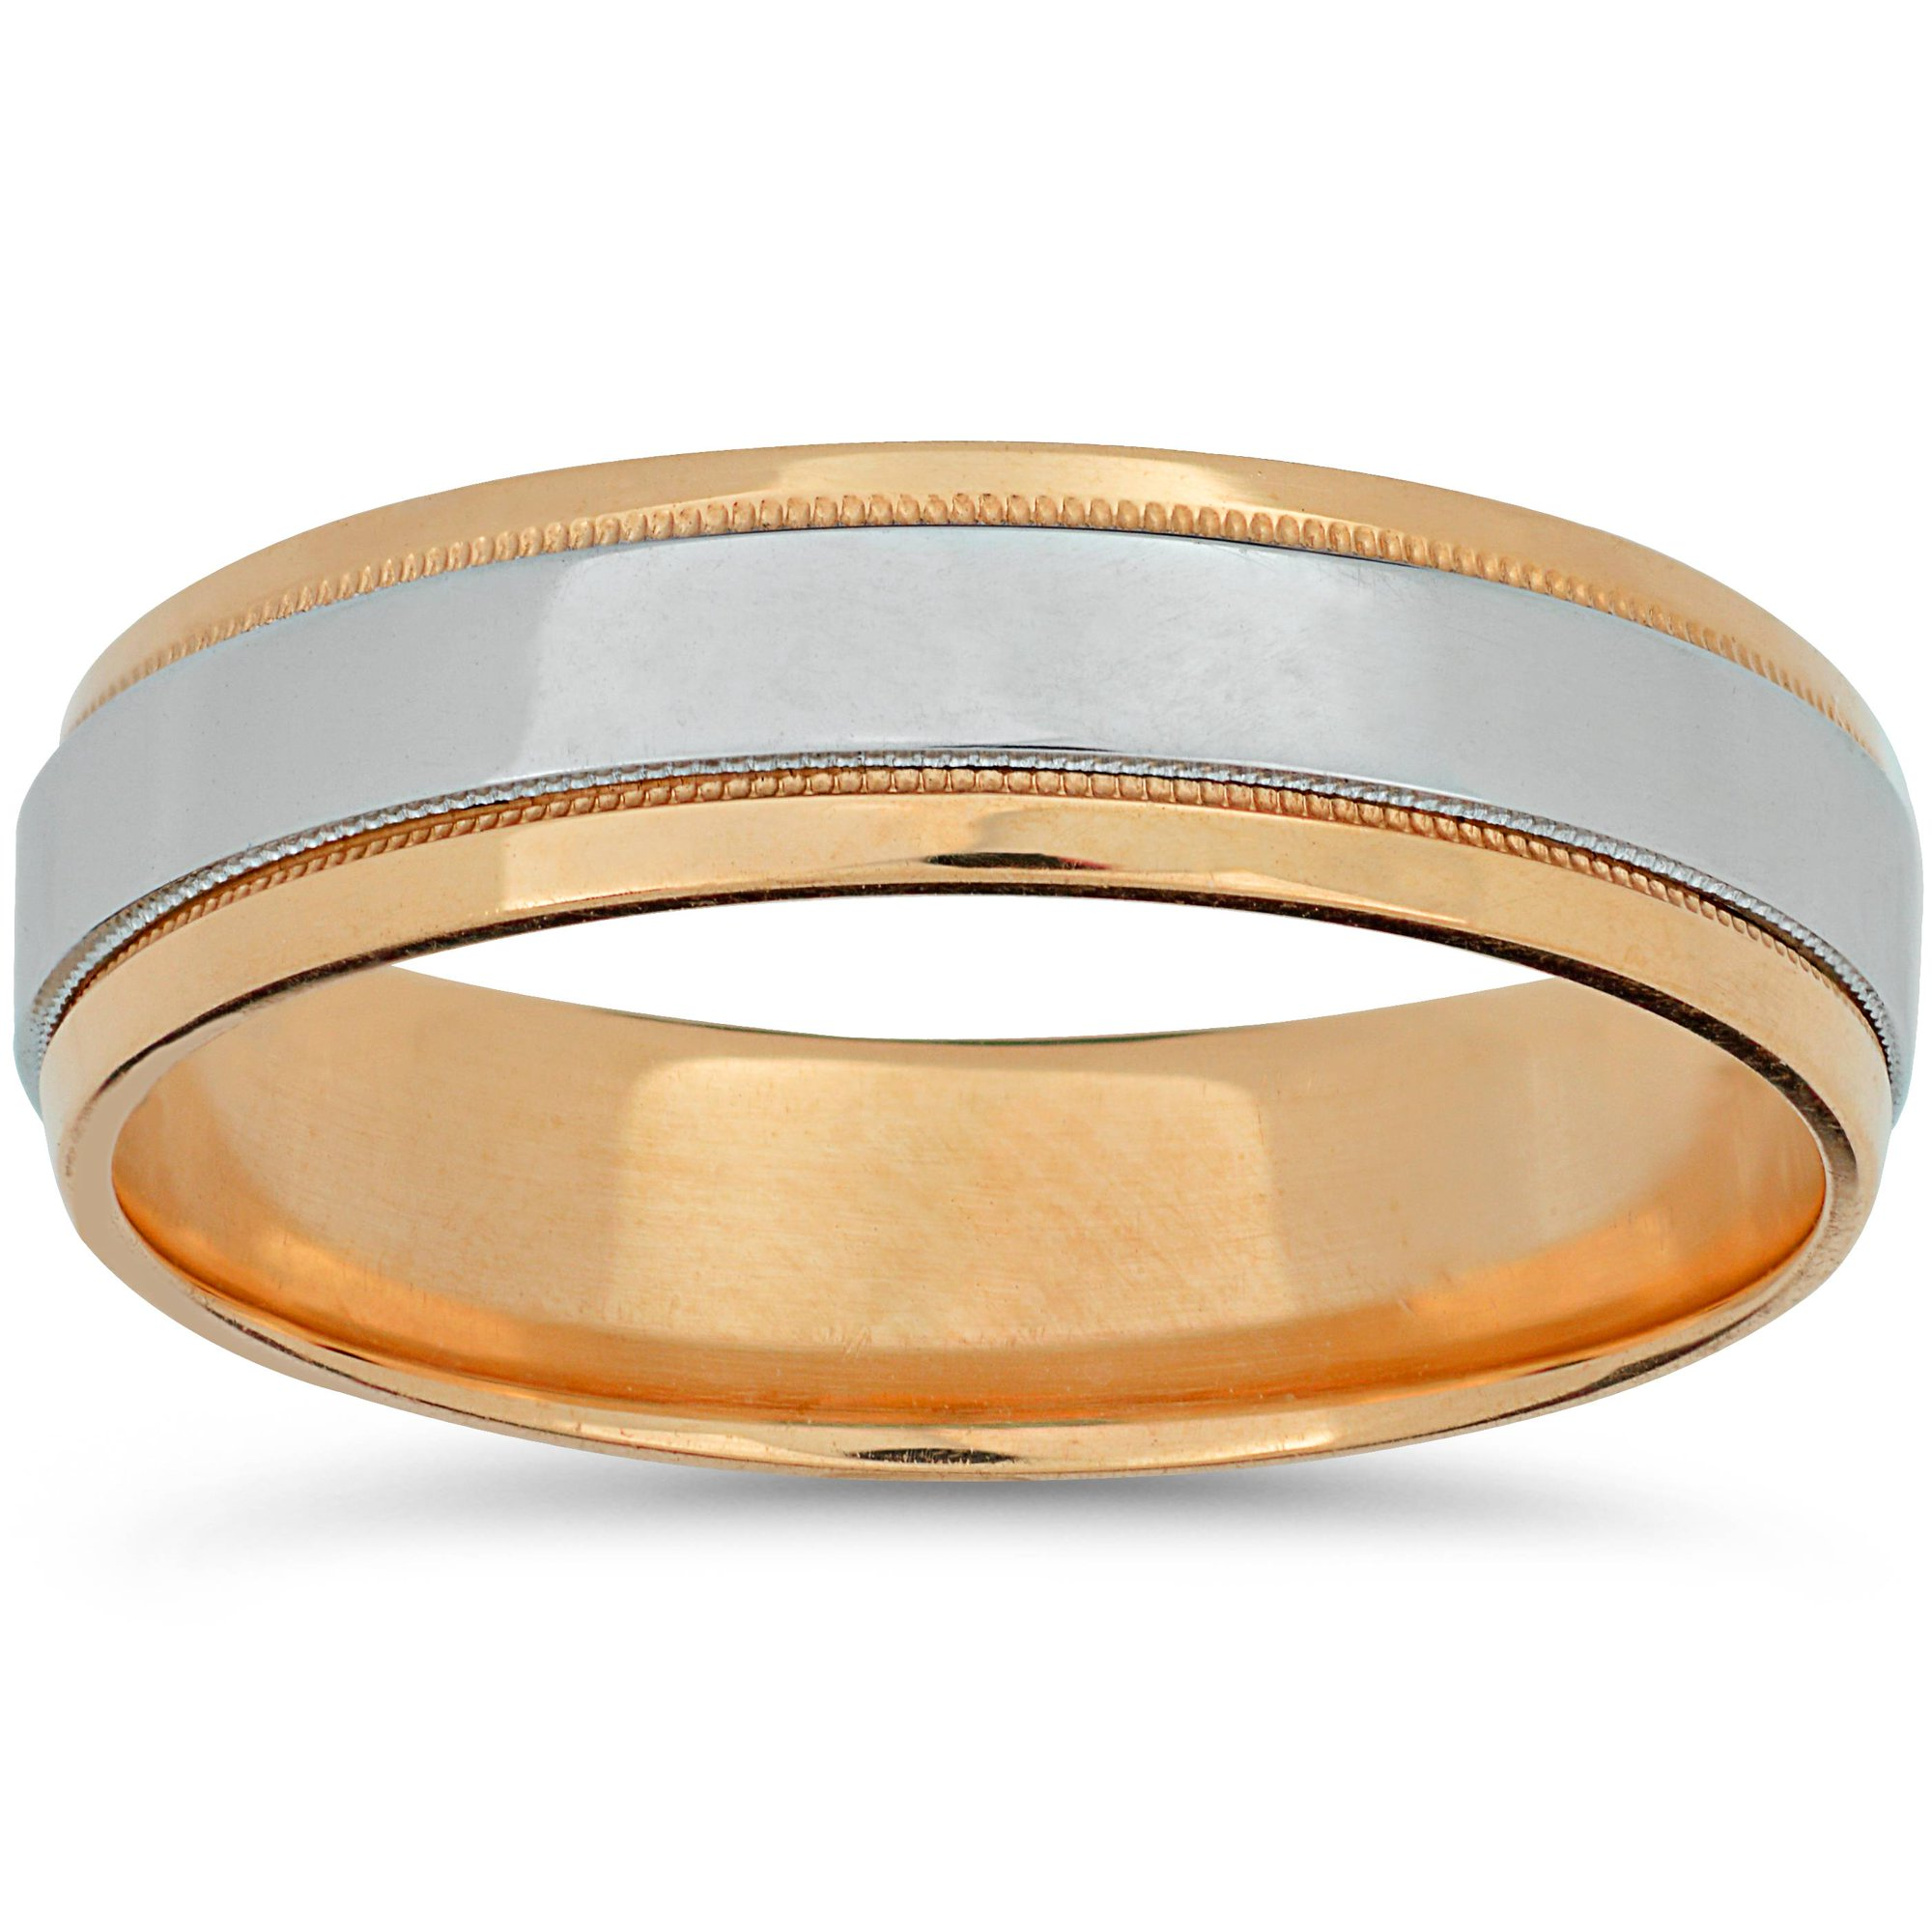 f76717e3ff1e1 Platinum & Rose Gold Two Tone Wedding Band Mens 14k High Polished ...